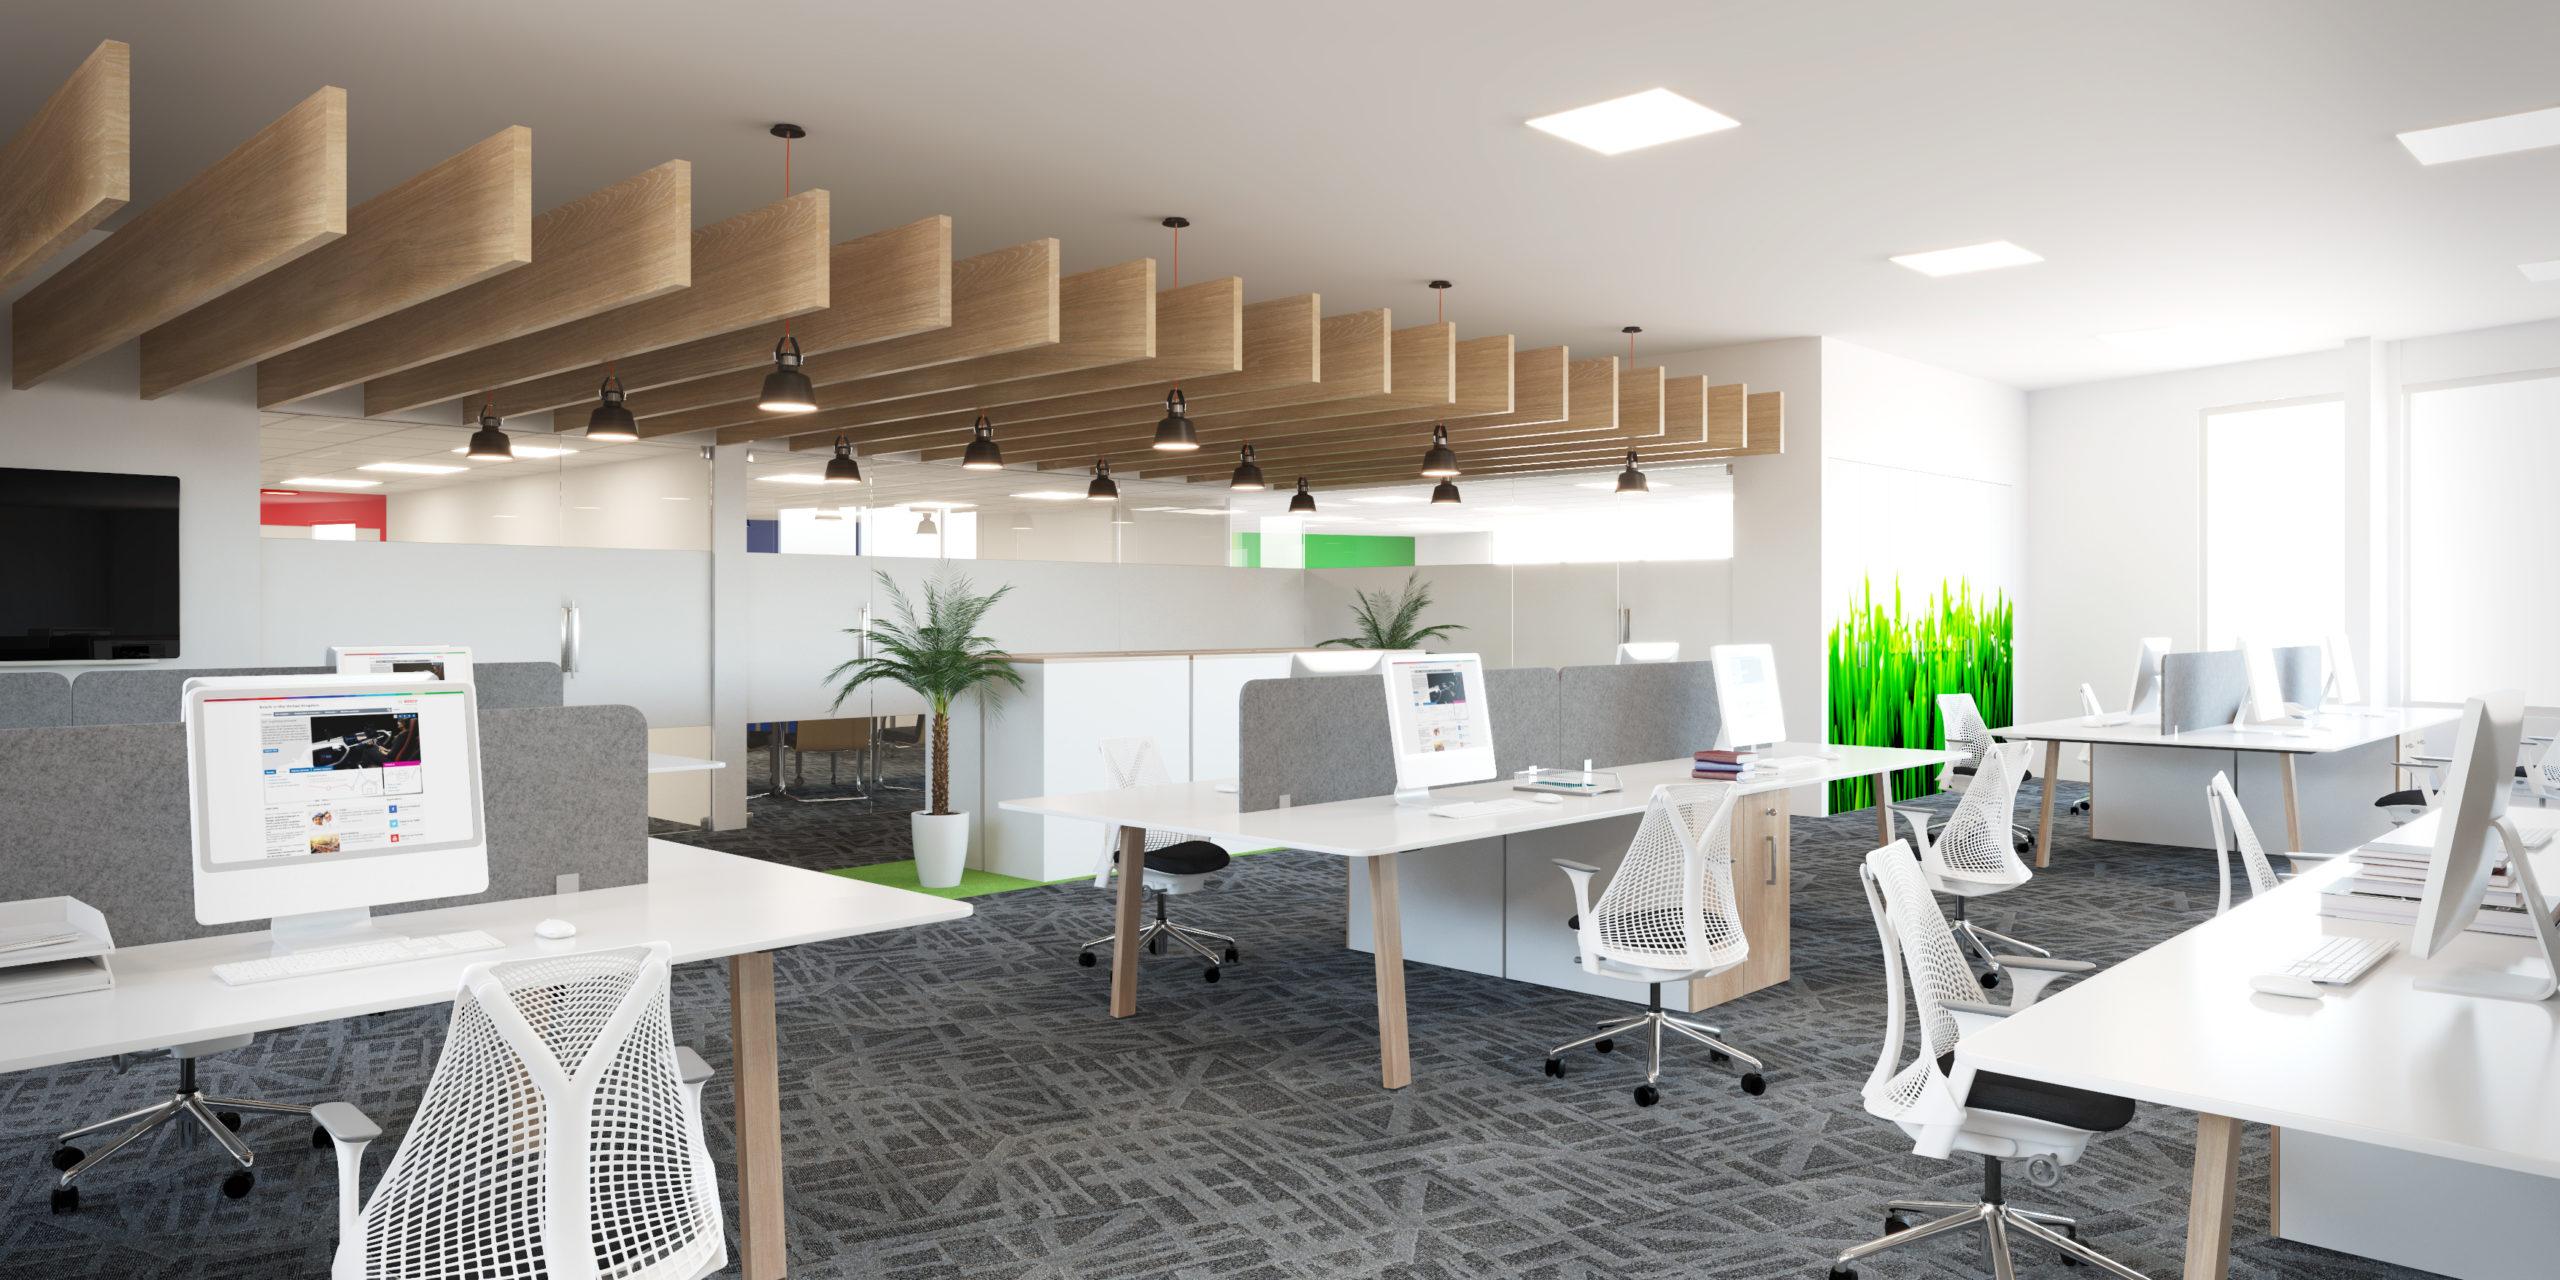 photorealistic-office-refurbishment-project-visual-B